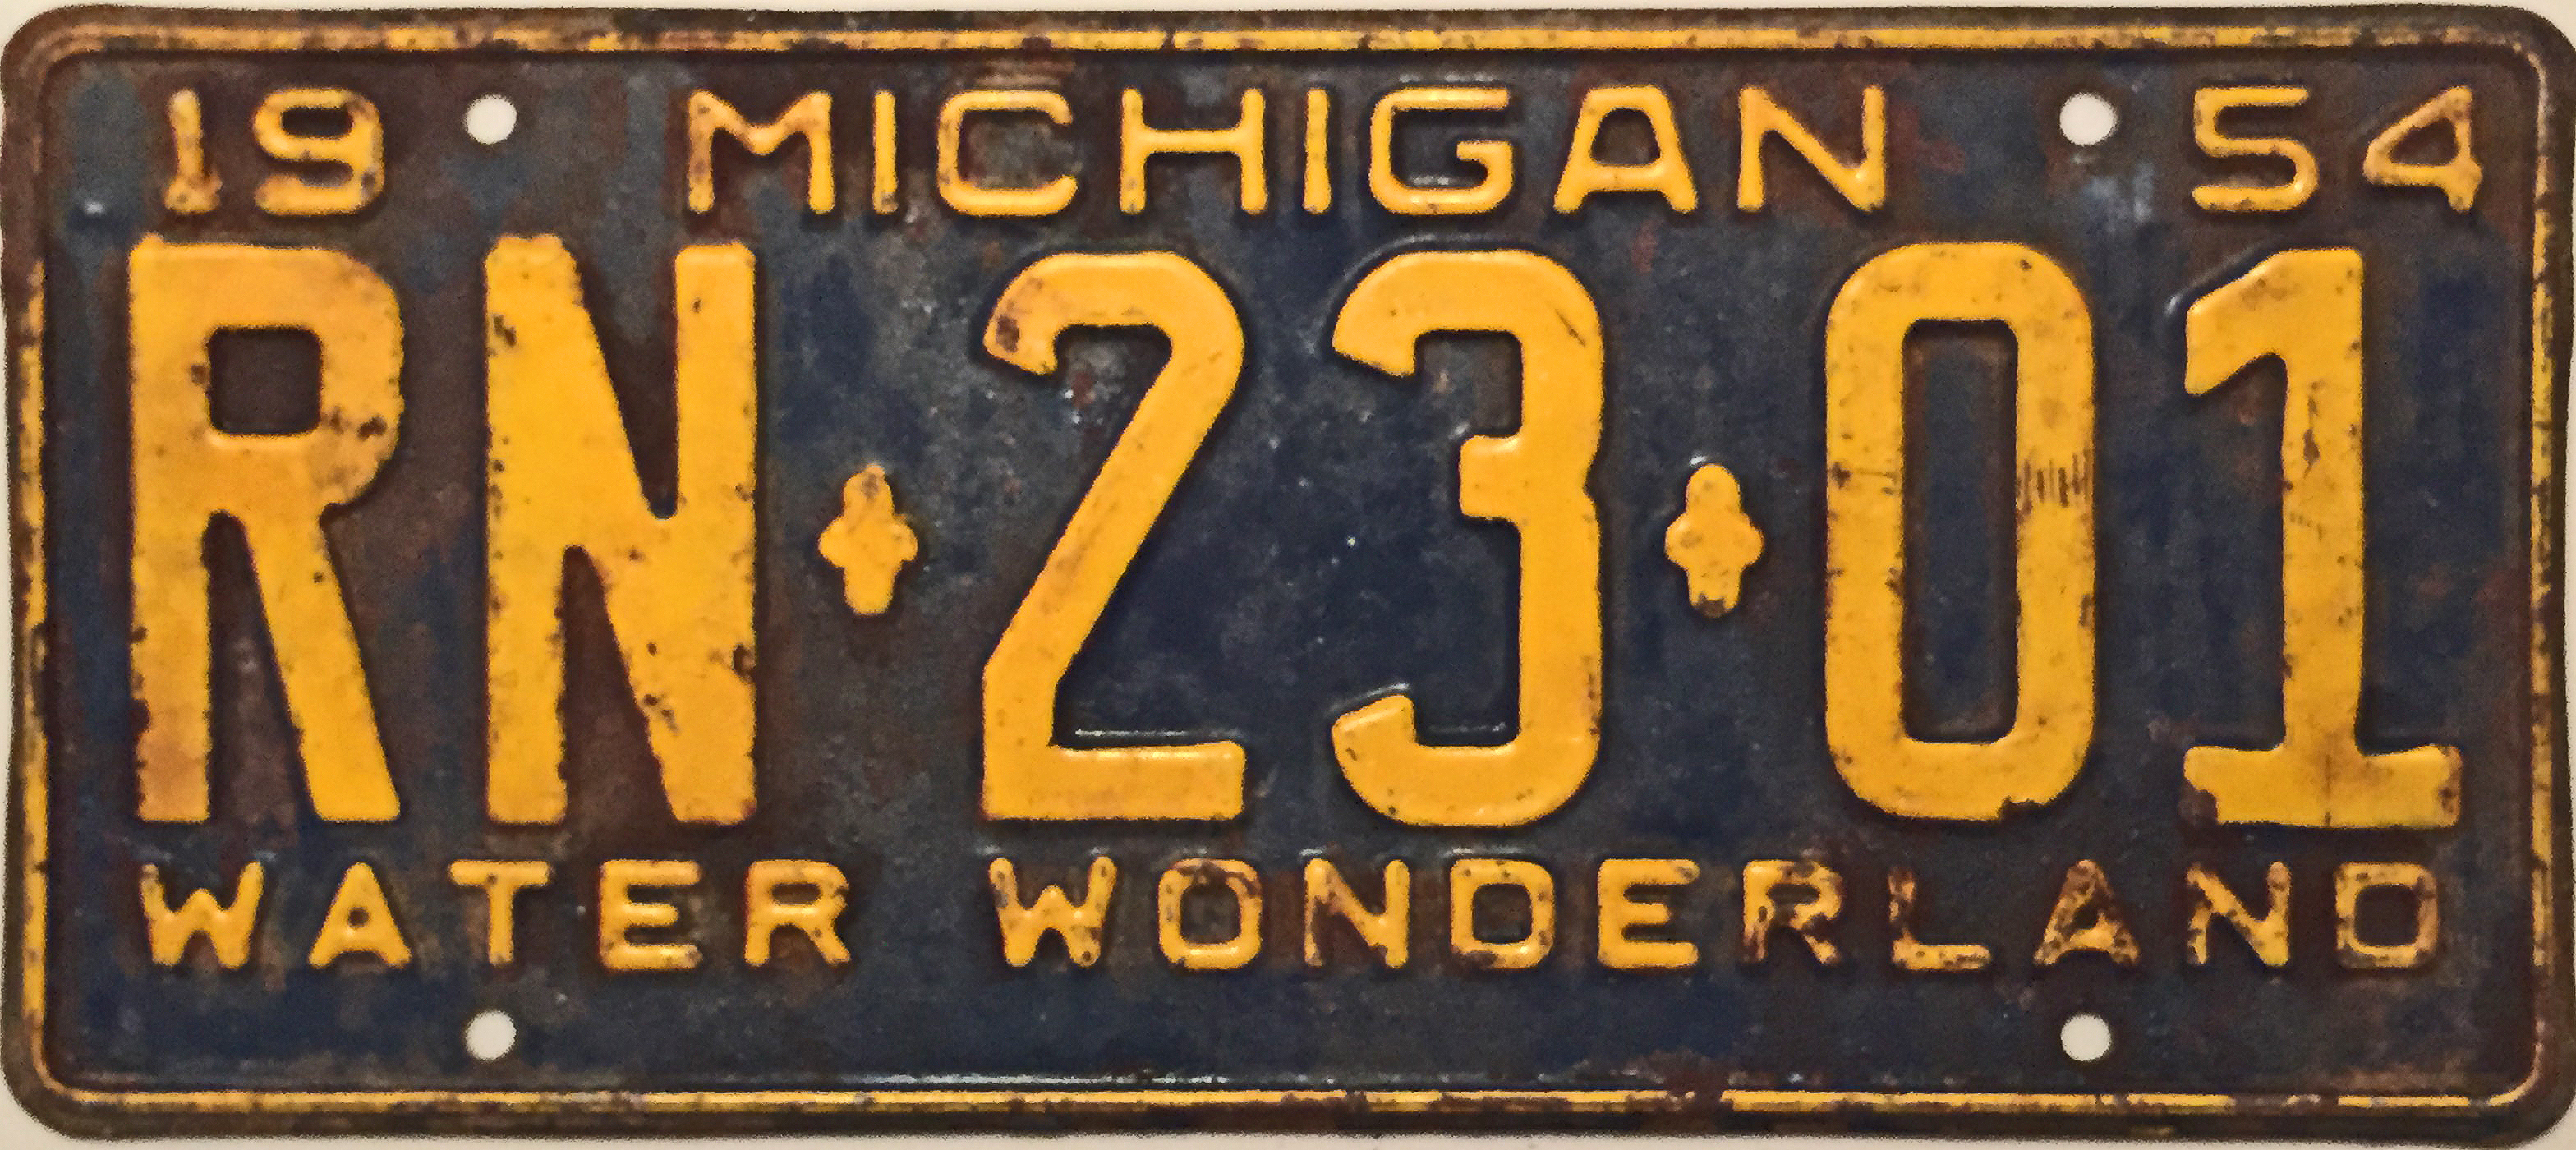 File:1954 Michigan License Plate.JPG - Wikimedia Commons